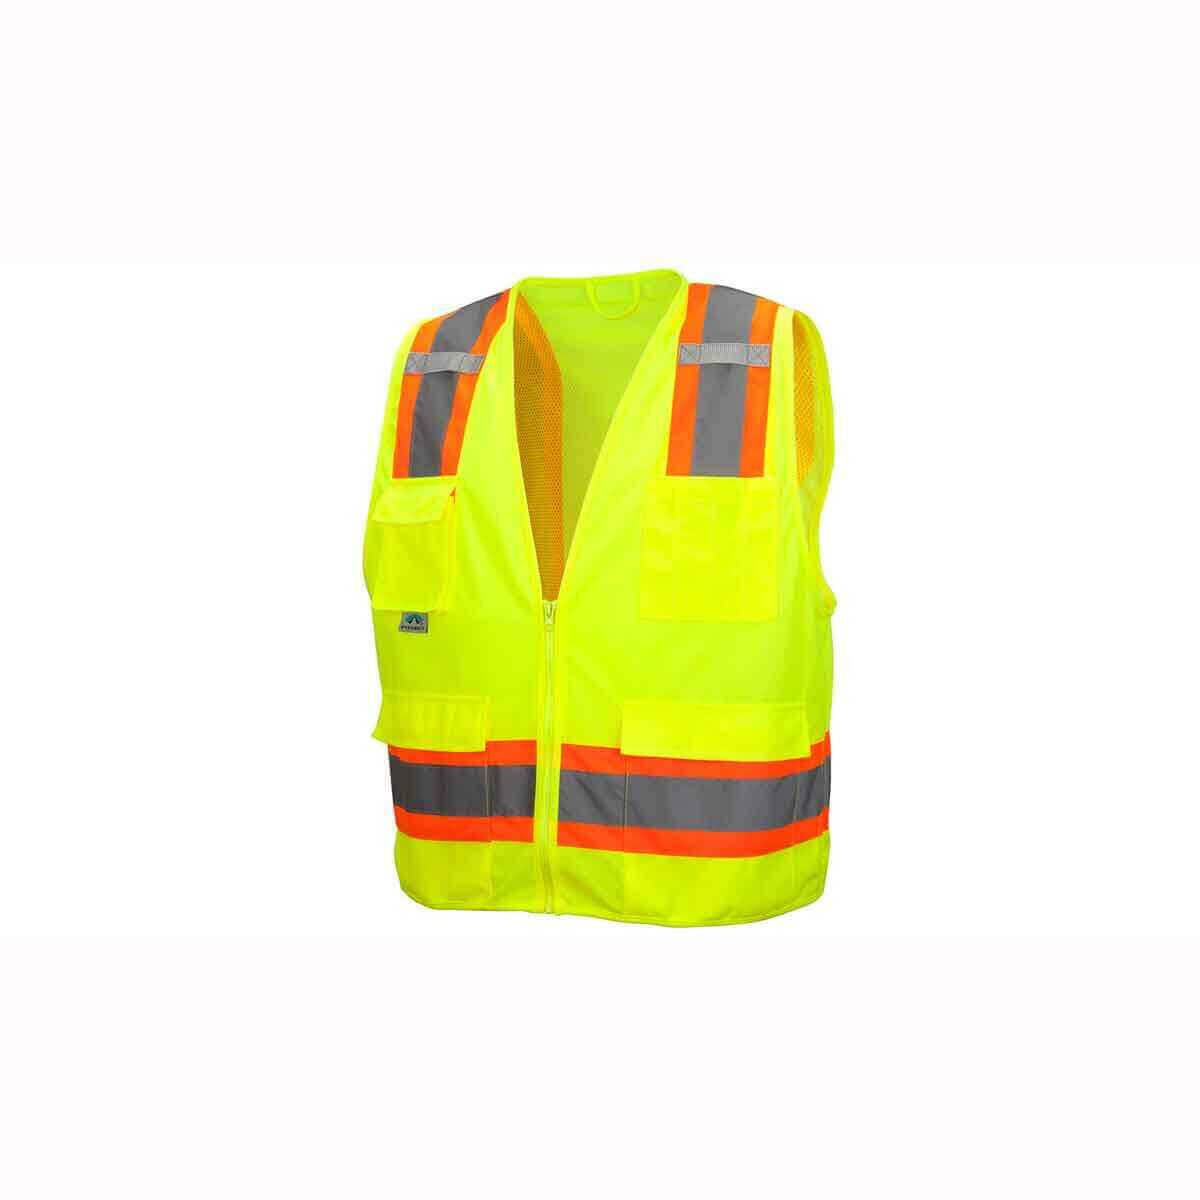 Pyramex RVZ24 Neon Line Safety Vests